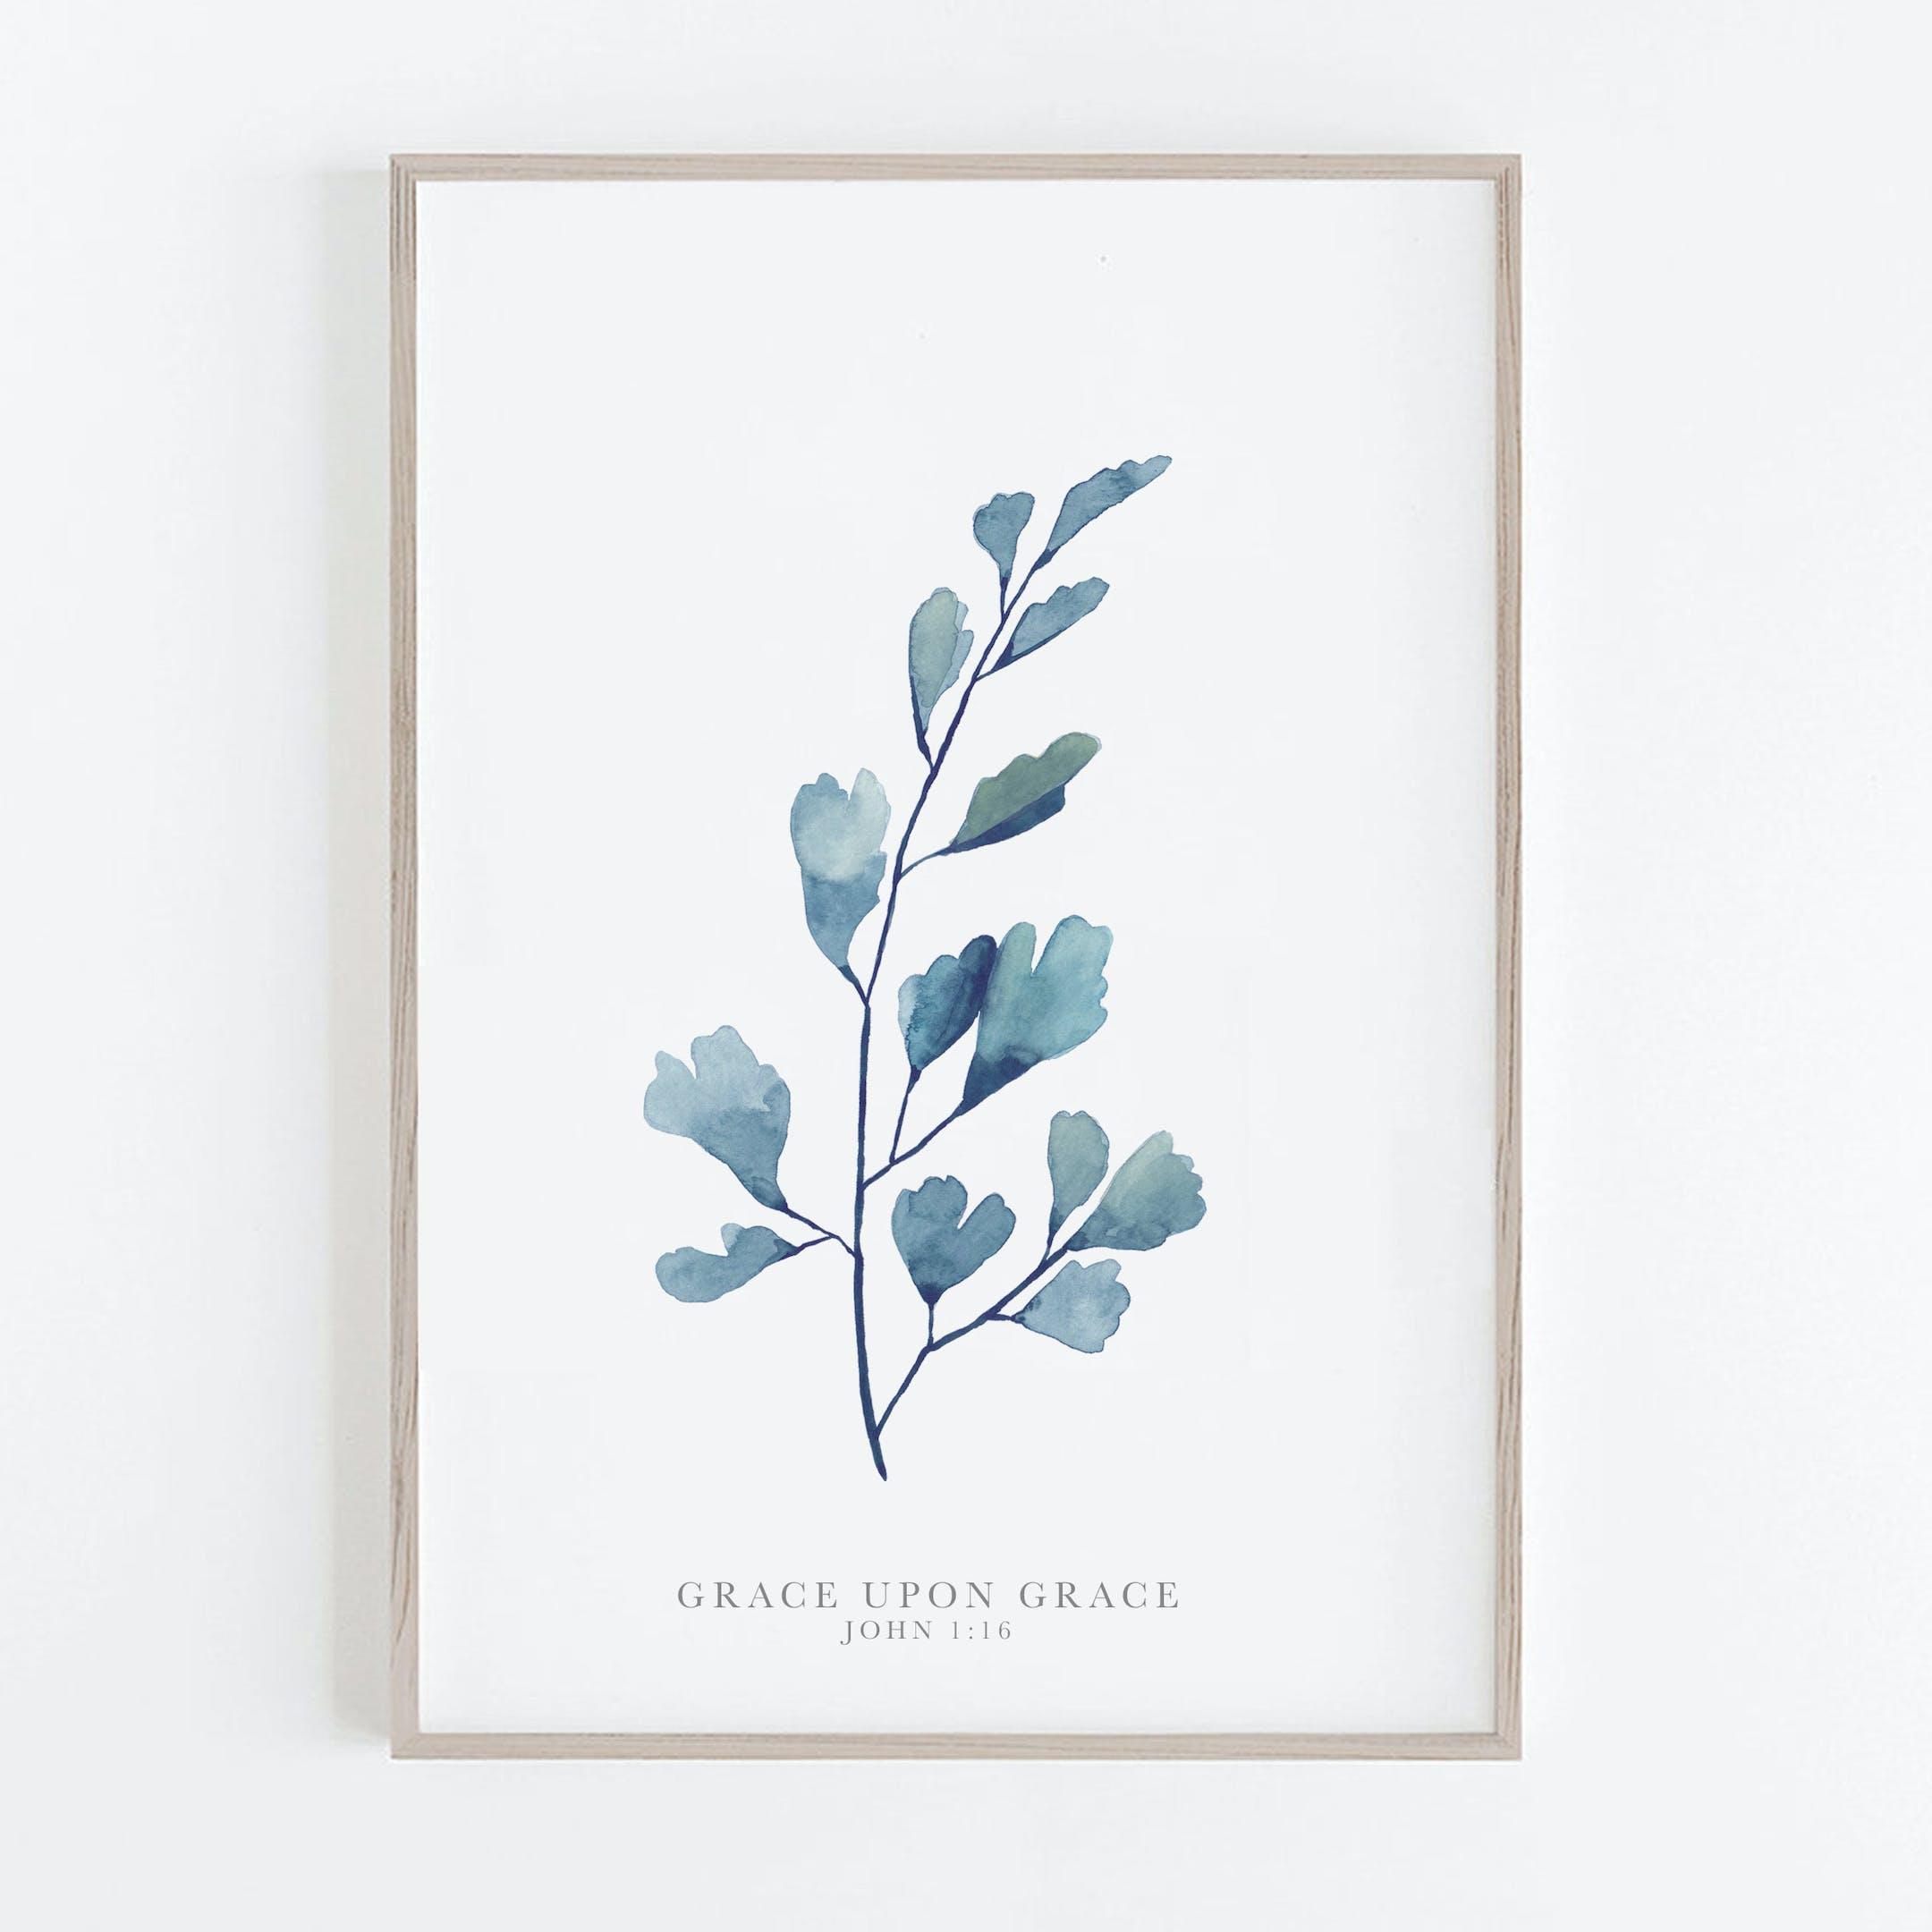 Botanical Maidenhead Fern Print - Grace upon Grace - John 1:16 - Christian Lettering Company